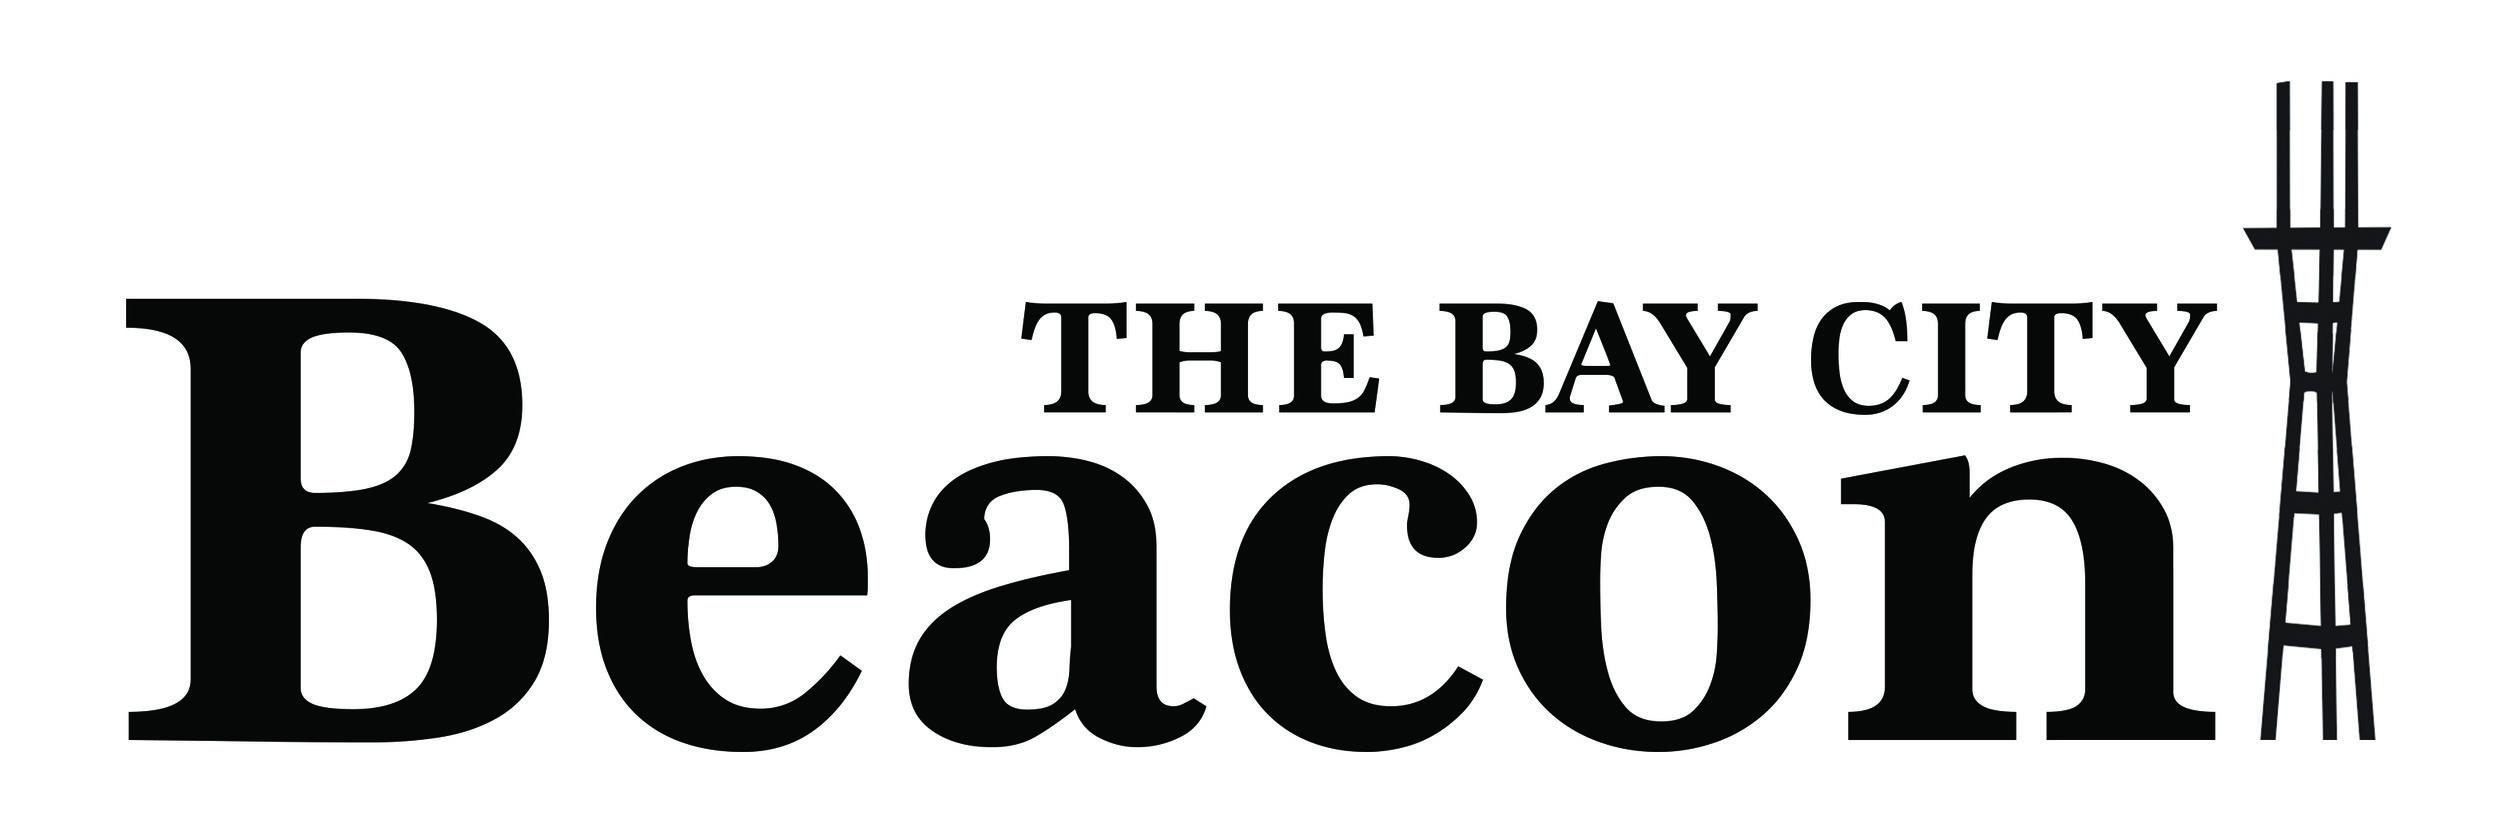 Topical Cannabis: Call It Cannabis, Please | The Bay City Beacon | Oct 24, 2017